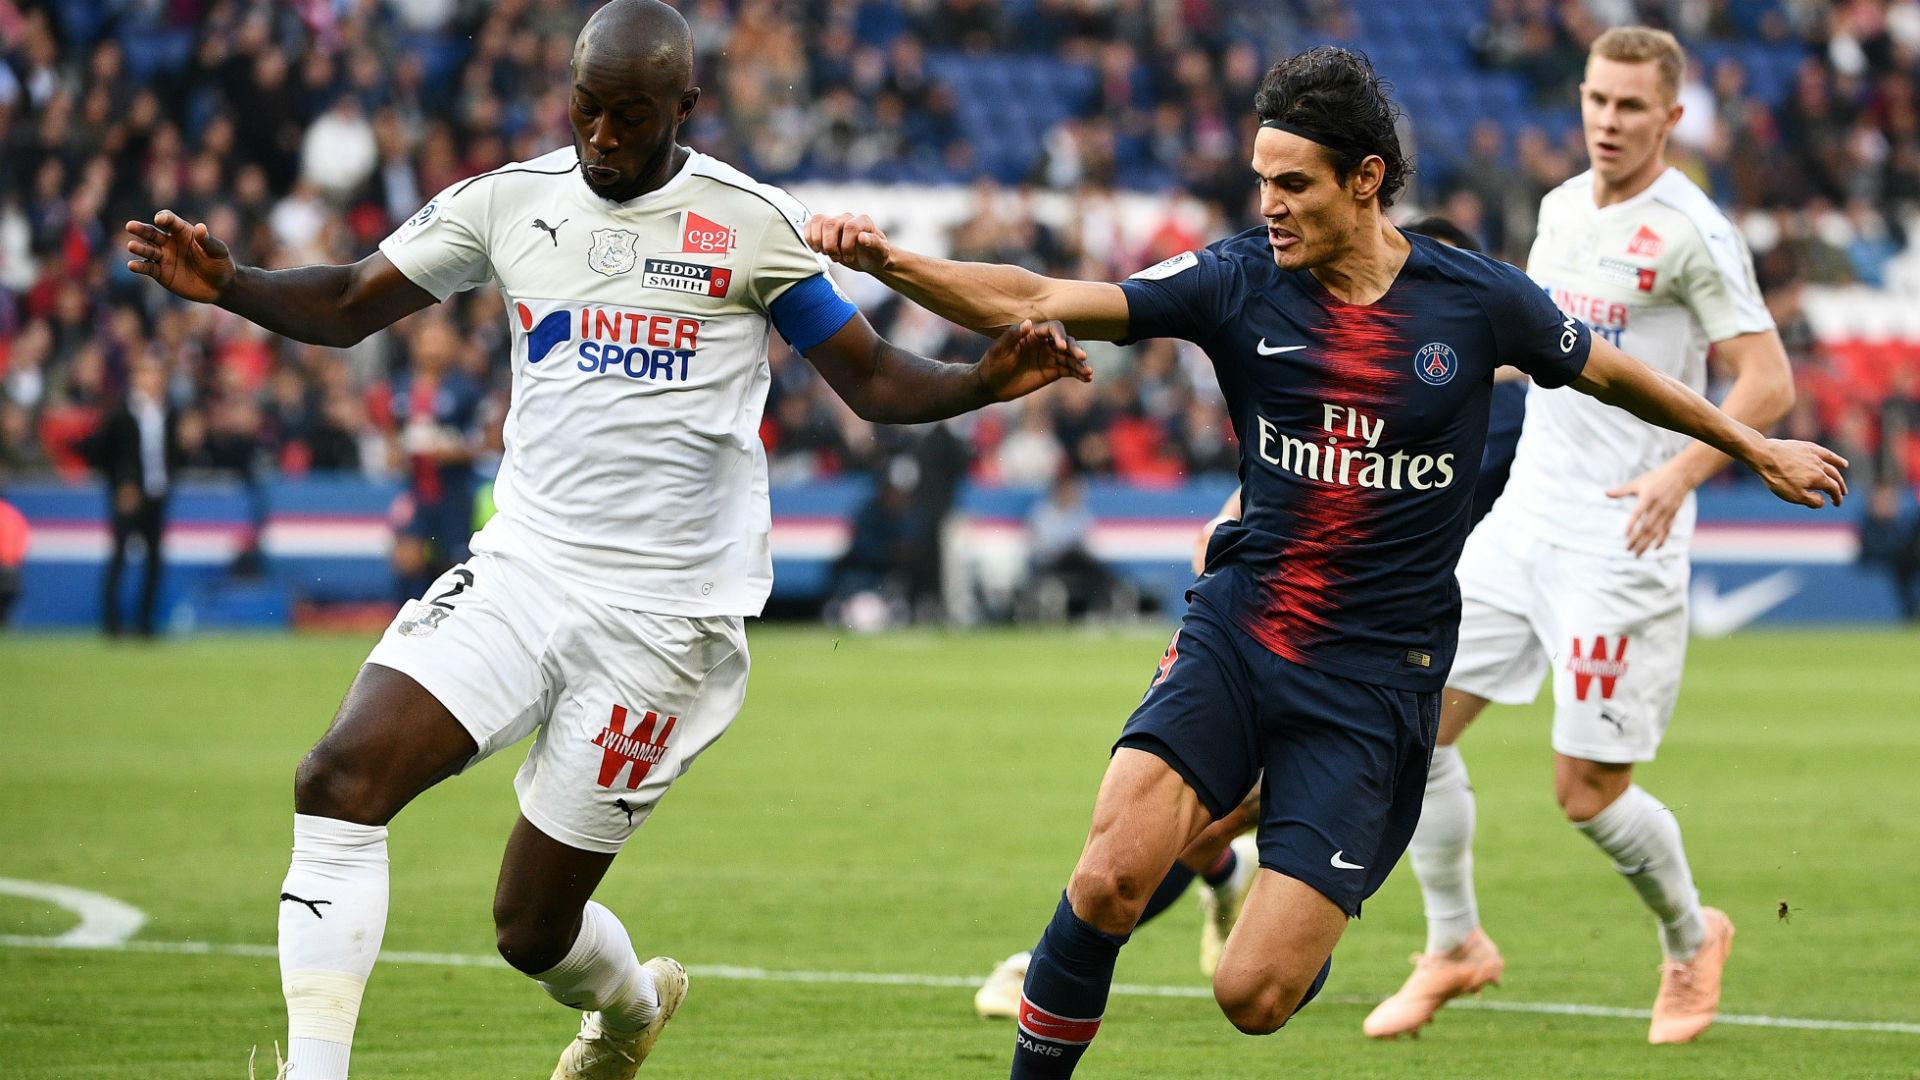 Edinson Cavani Prince Gouano PSG Amiens Ligue 1 20102018